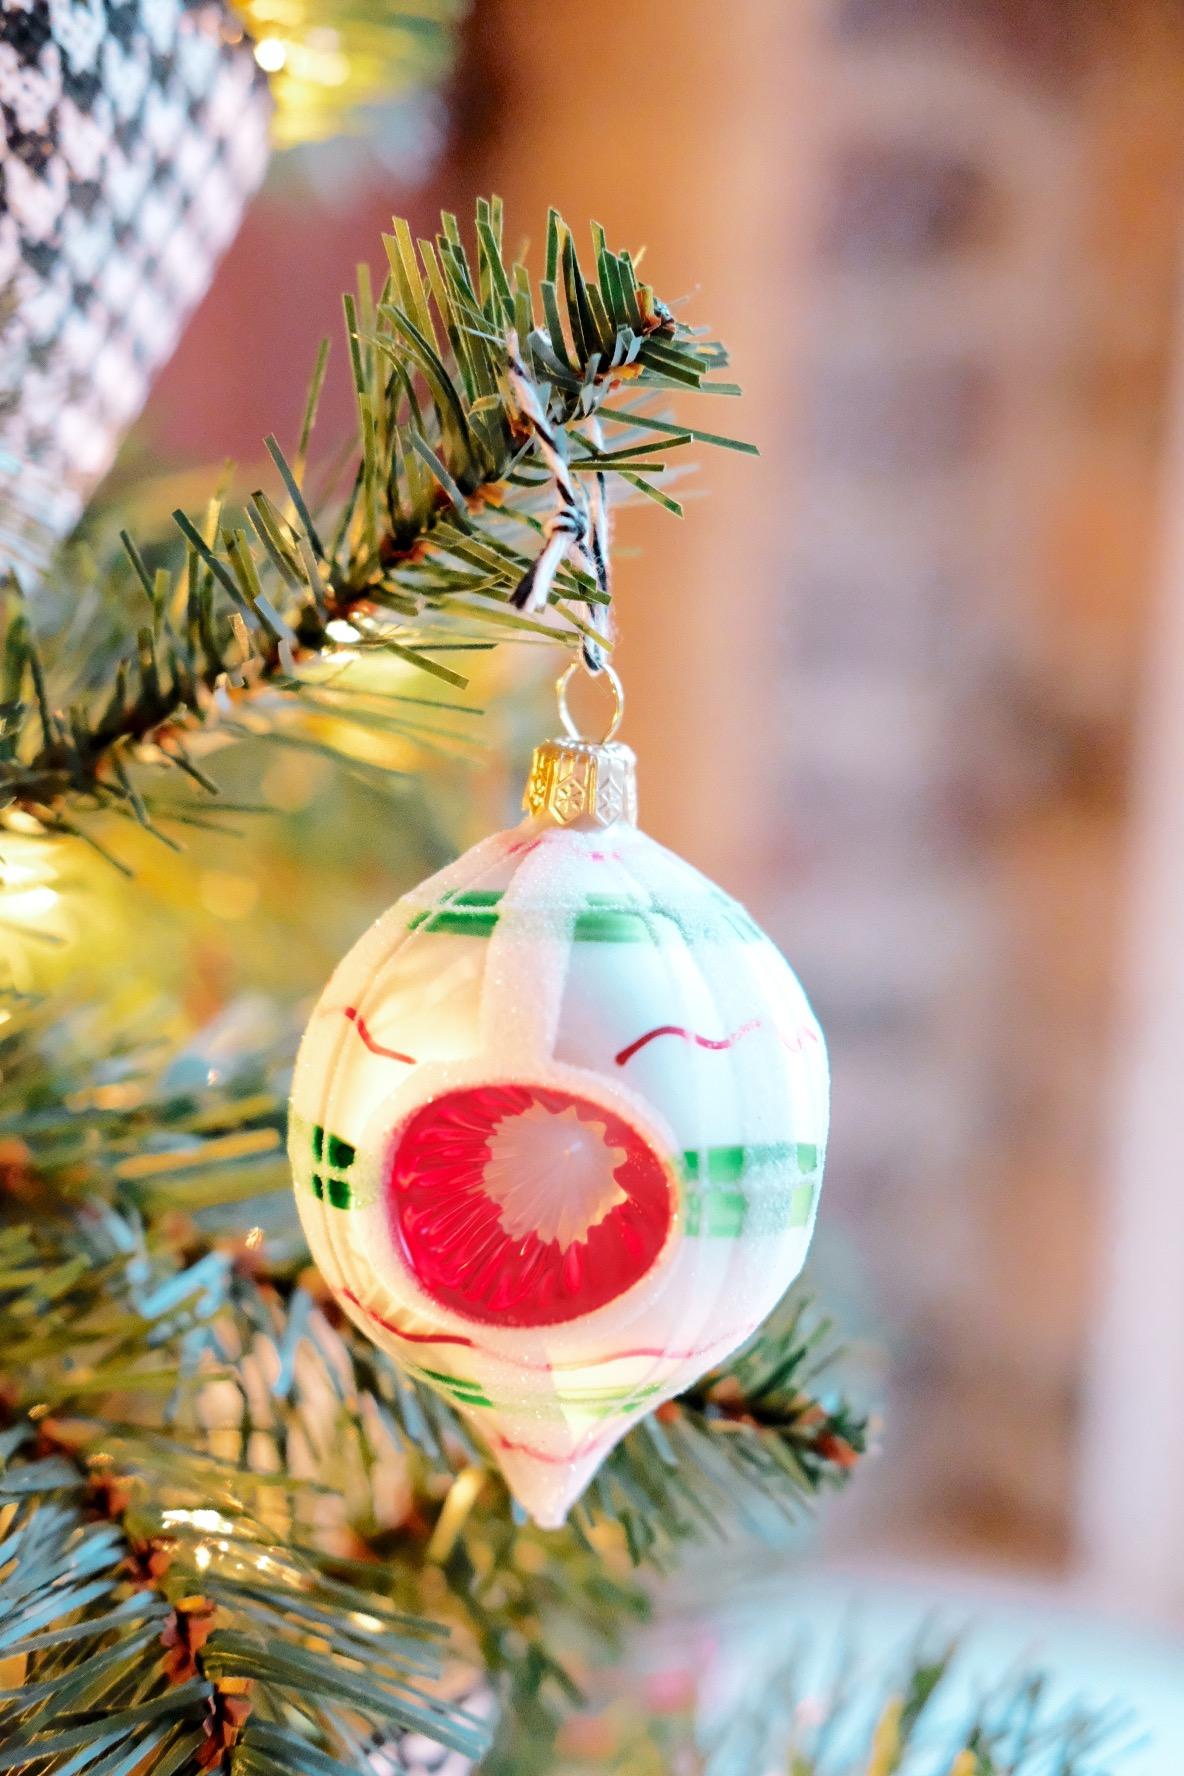 Plaid Christmas ornaments, Small Christmas Tree decorations, Dog Proof Christmas Tree, Christmas Tree on Vintage Suitcases, Fake Christmas Tree DIY Skirt, Vintage Ornaments, Christopher Radko Shiny Brite Ornaments.